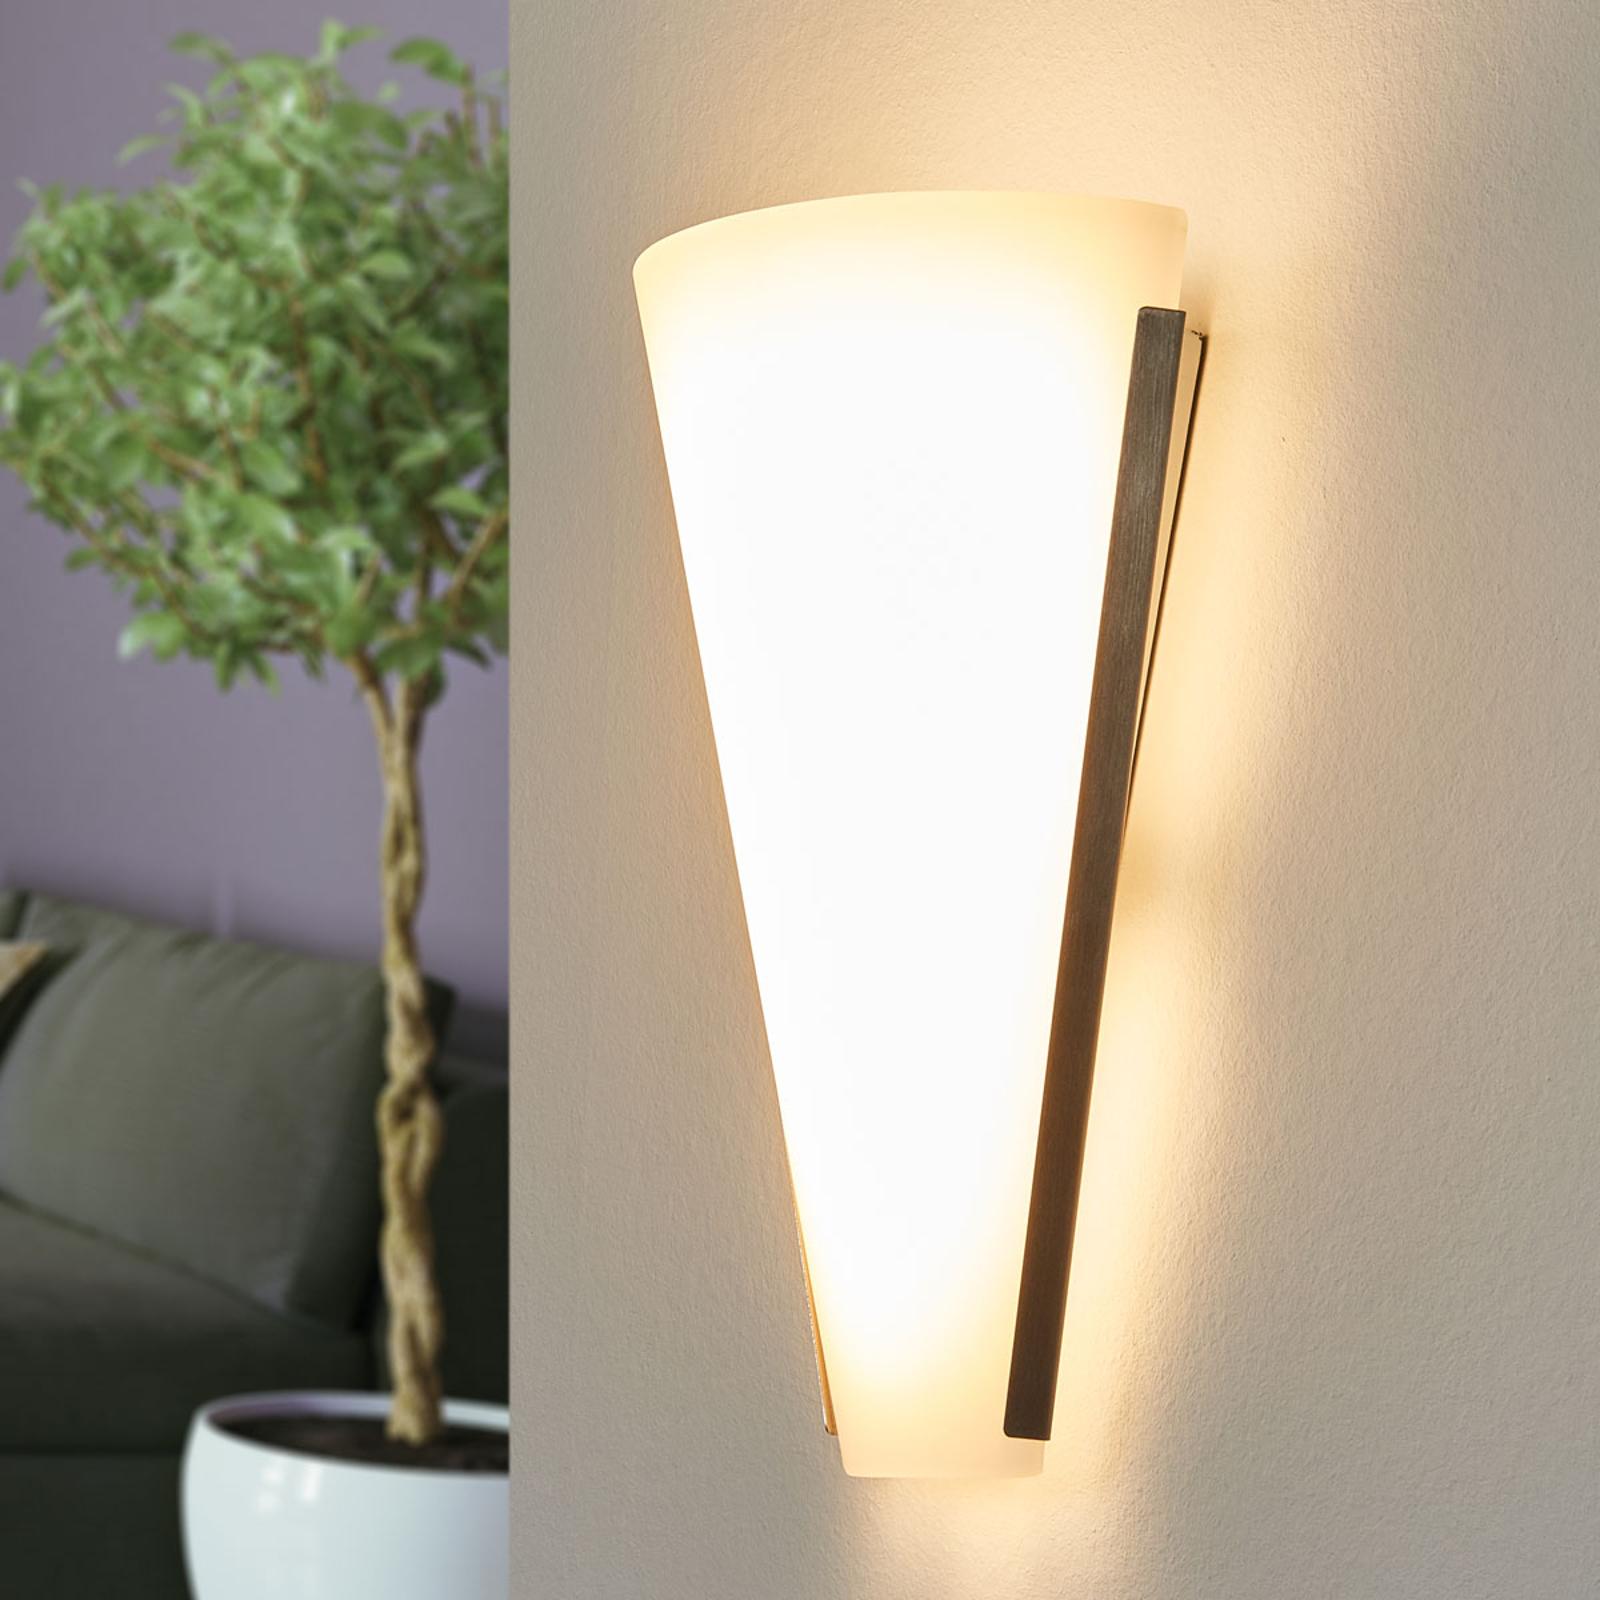 Mooie wandlamp Luk met LEDs